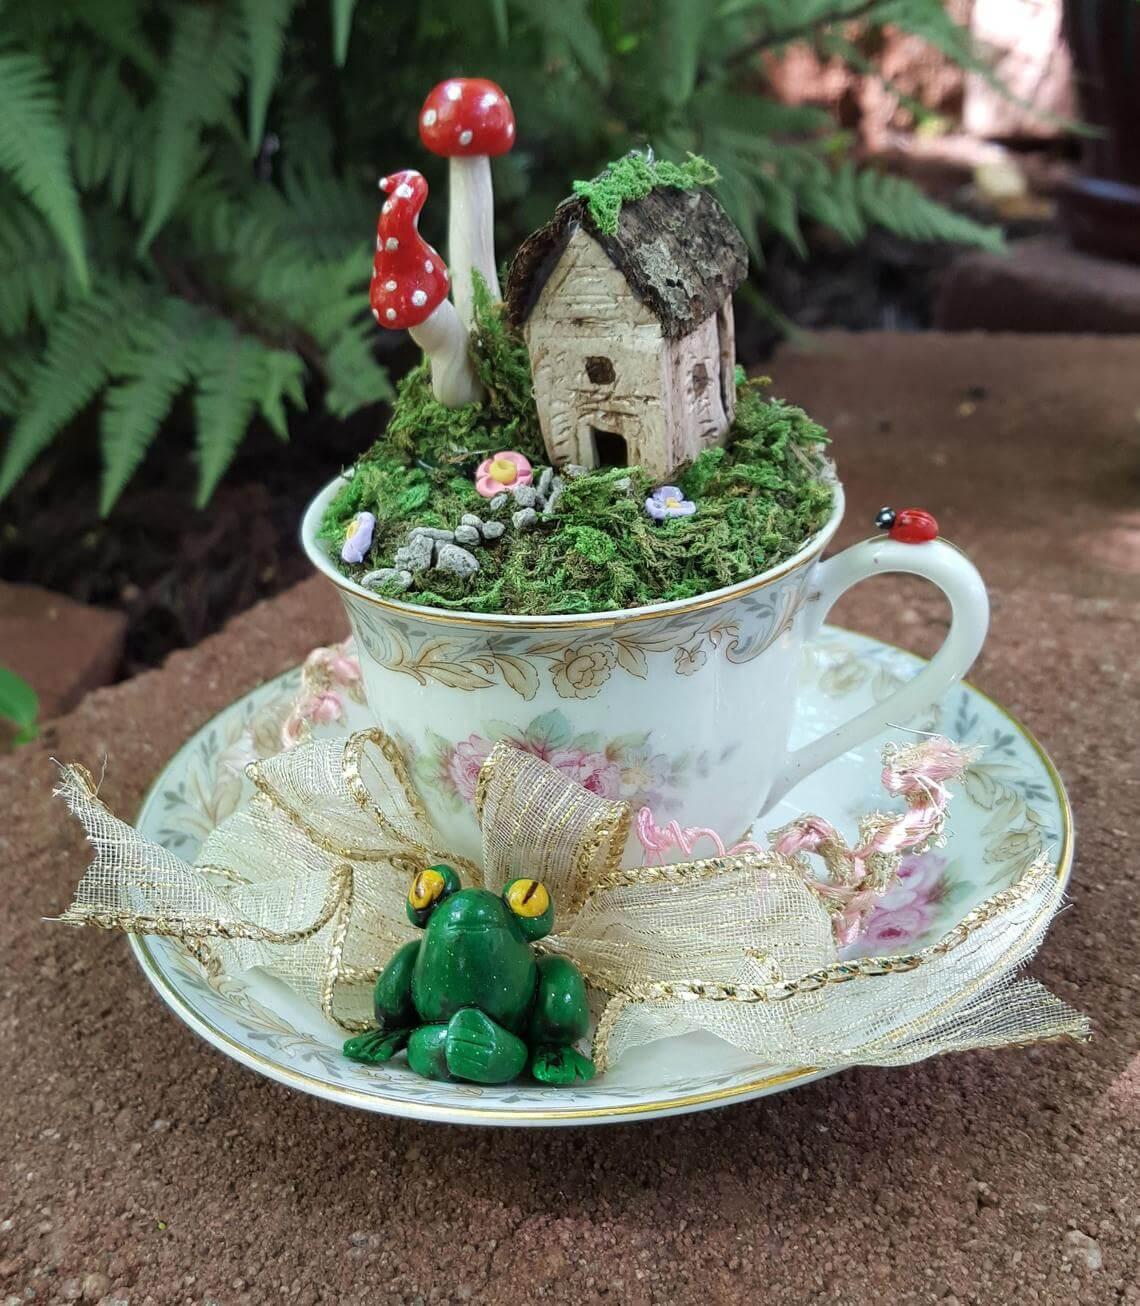 Jardin miniature de tasse de thé victorien rustique